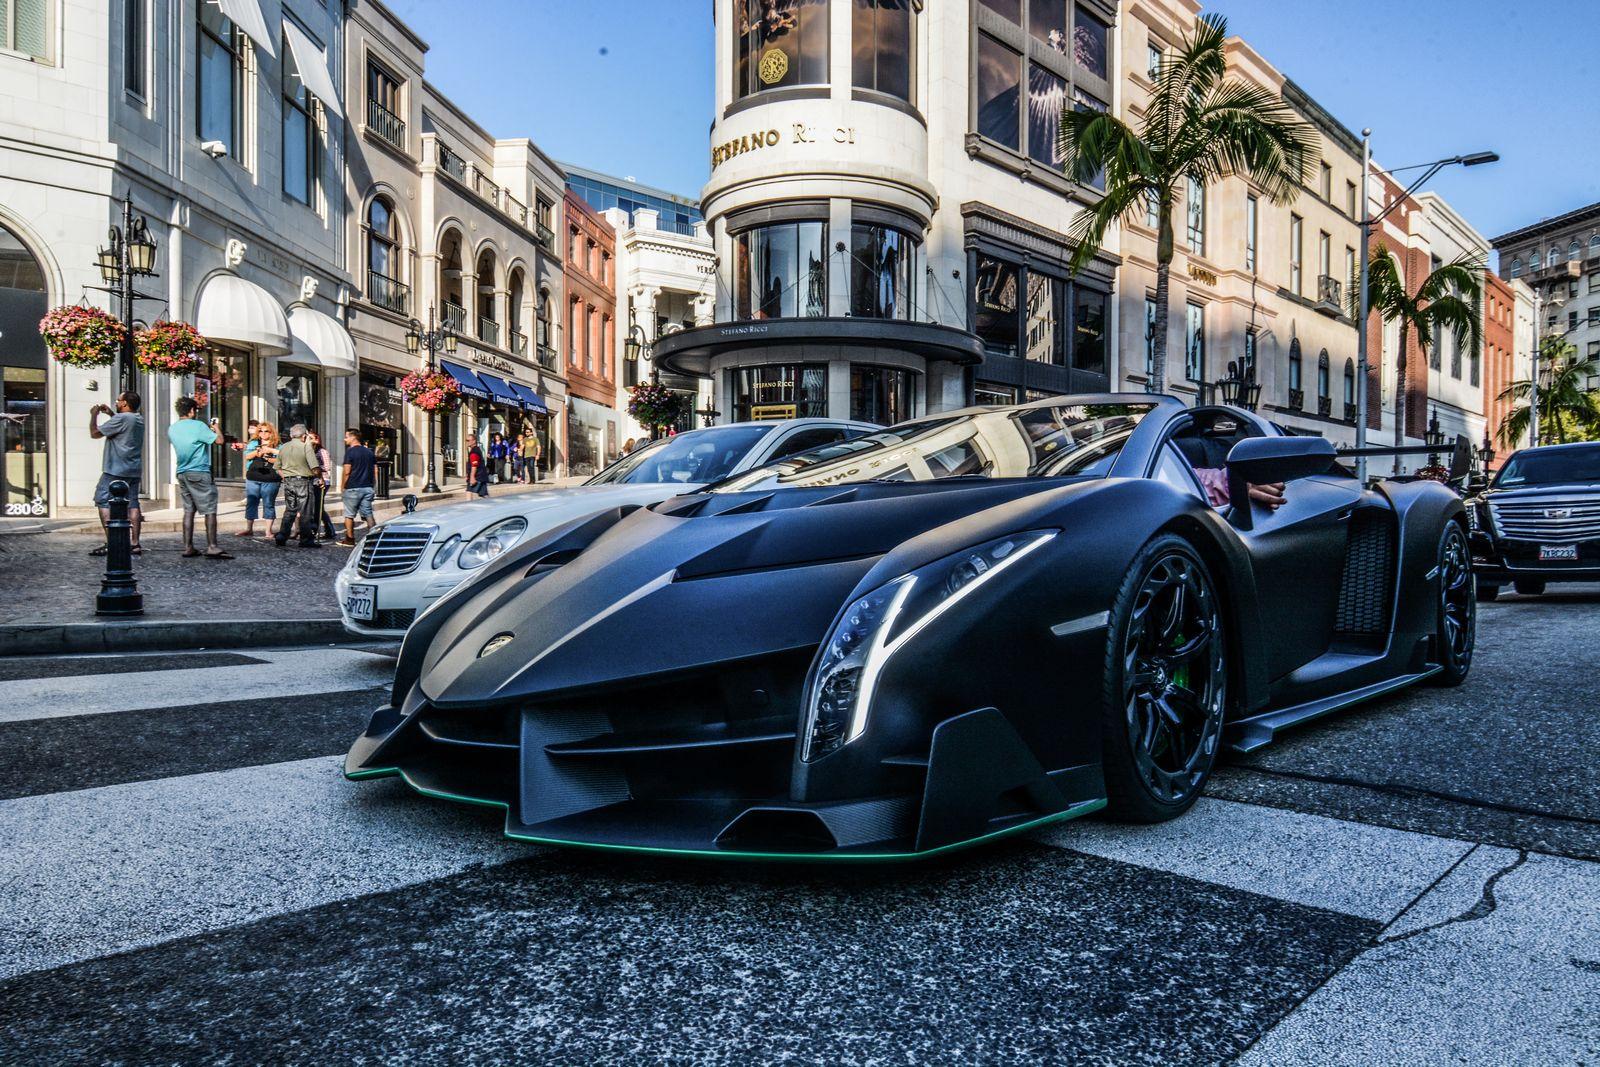 ... Lamborghini Veneno Roadster In Beverly Hills. Hypercars ...